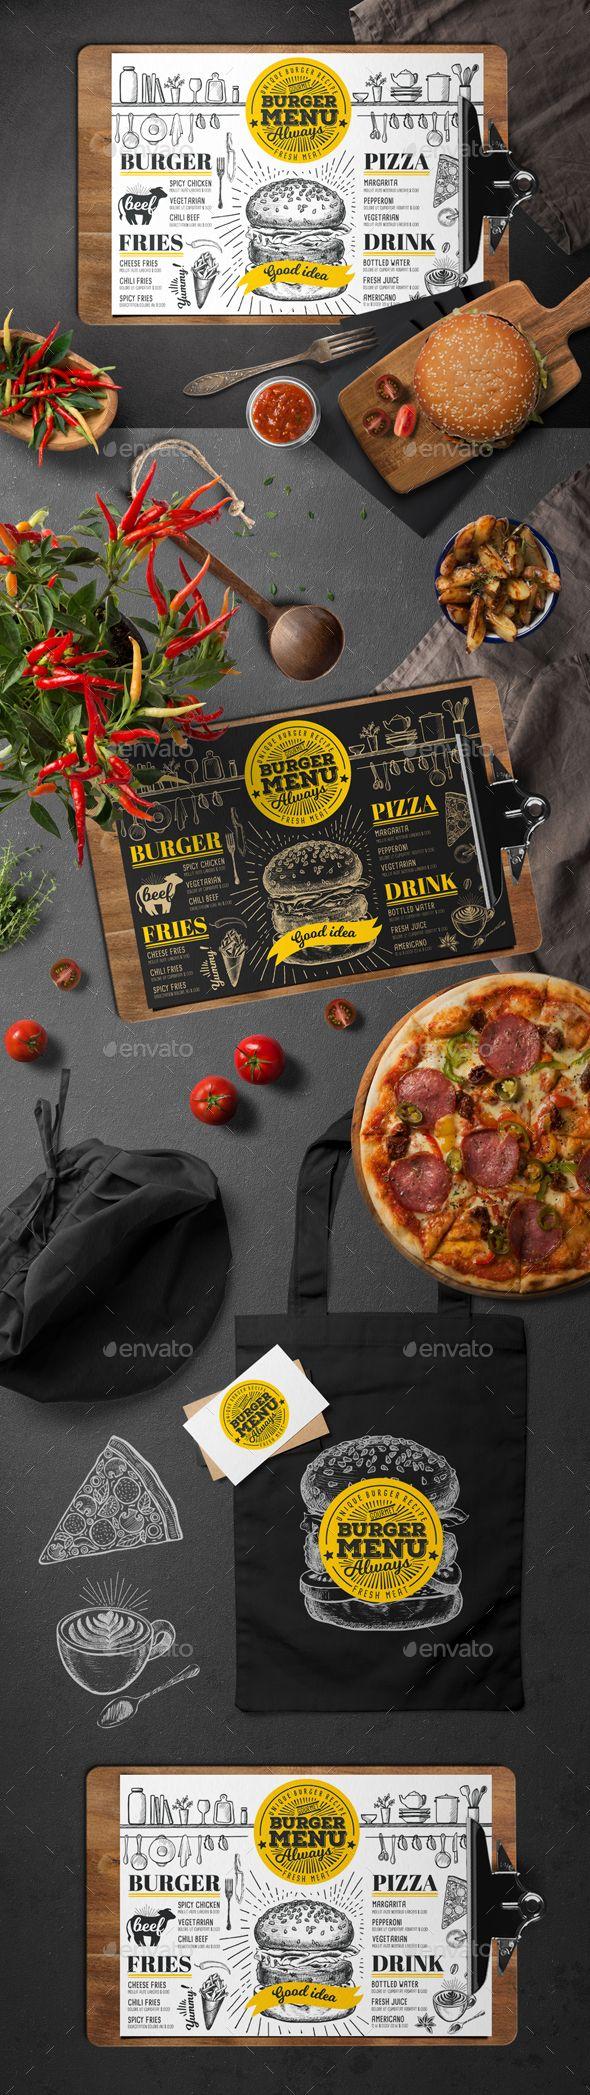 Food Menu Template PSD, Vector EPS